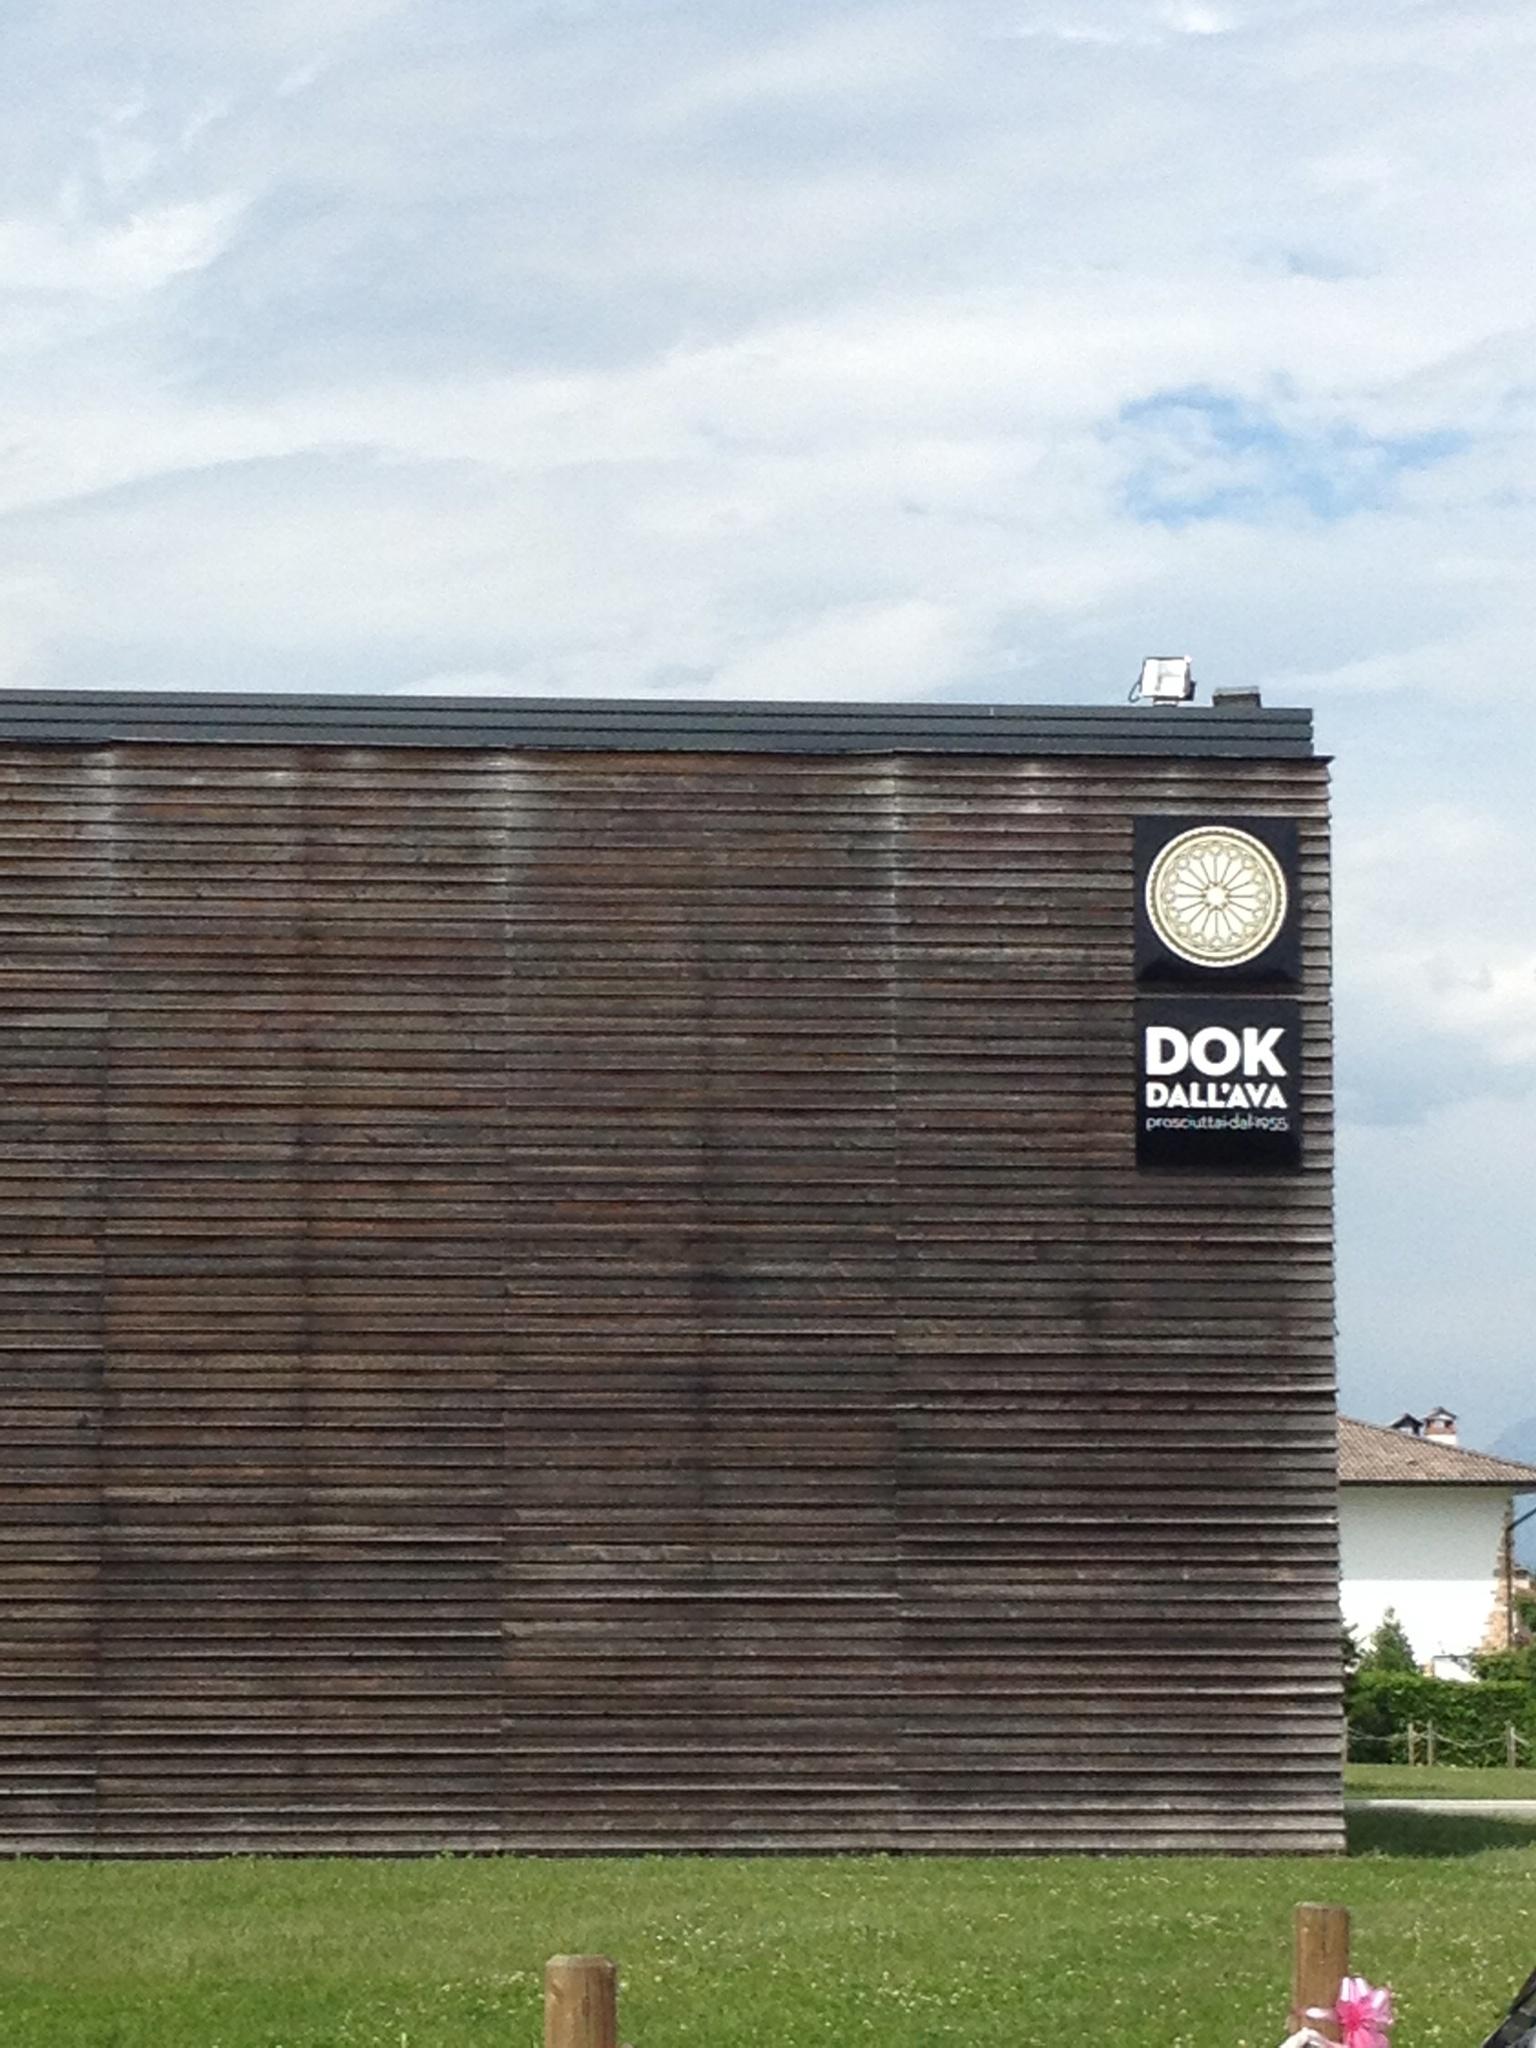 Dok Ham Factory, Prosciutteria Dok Dall'Ava